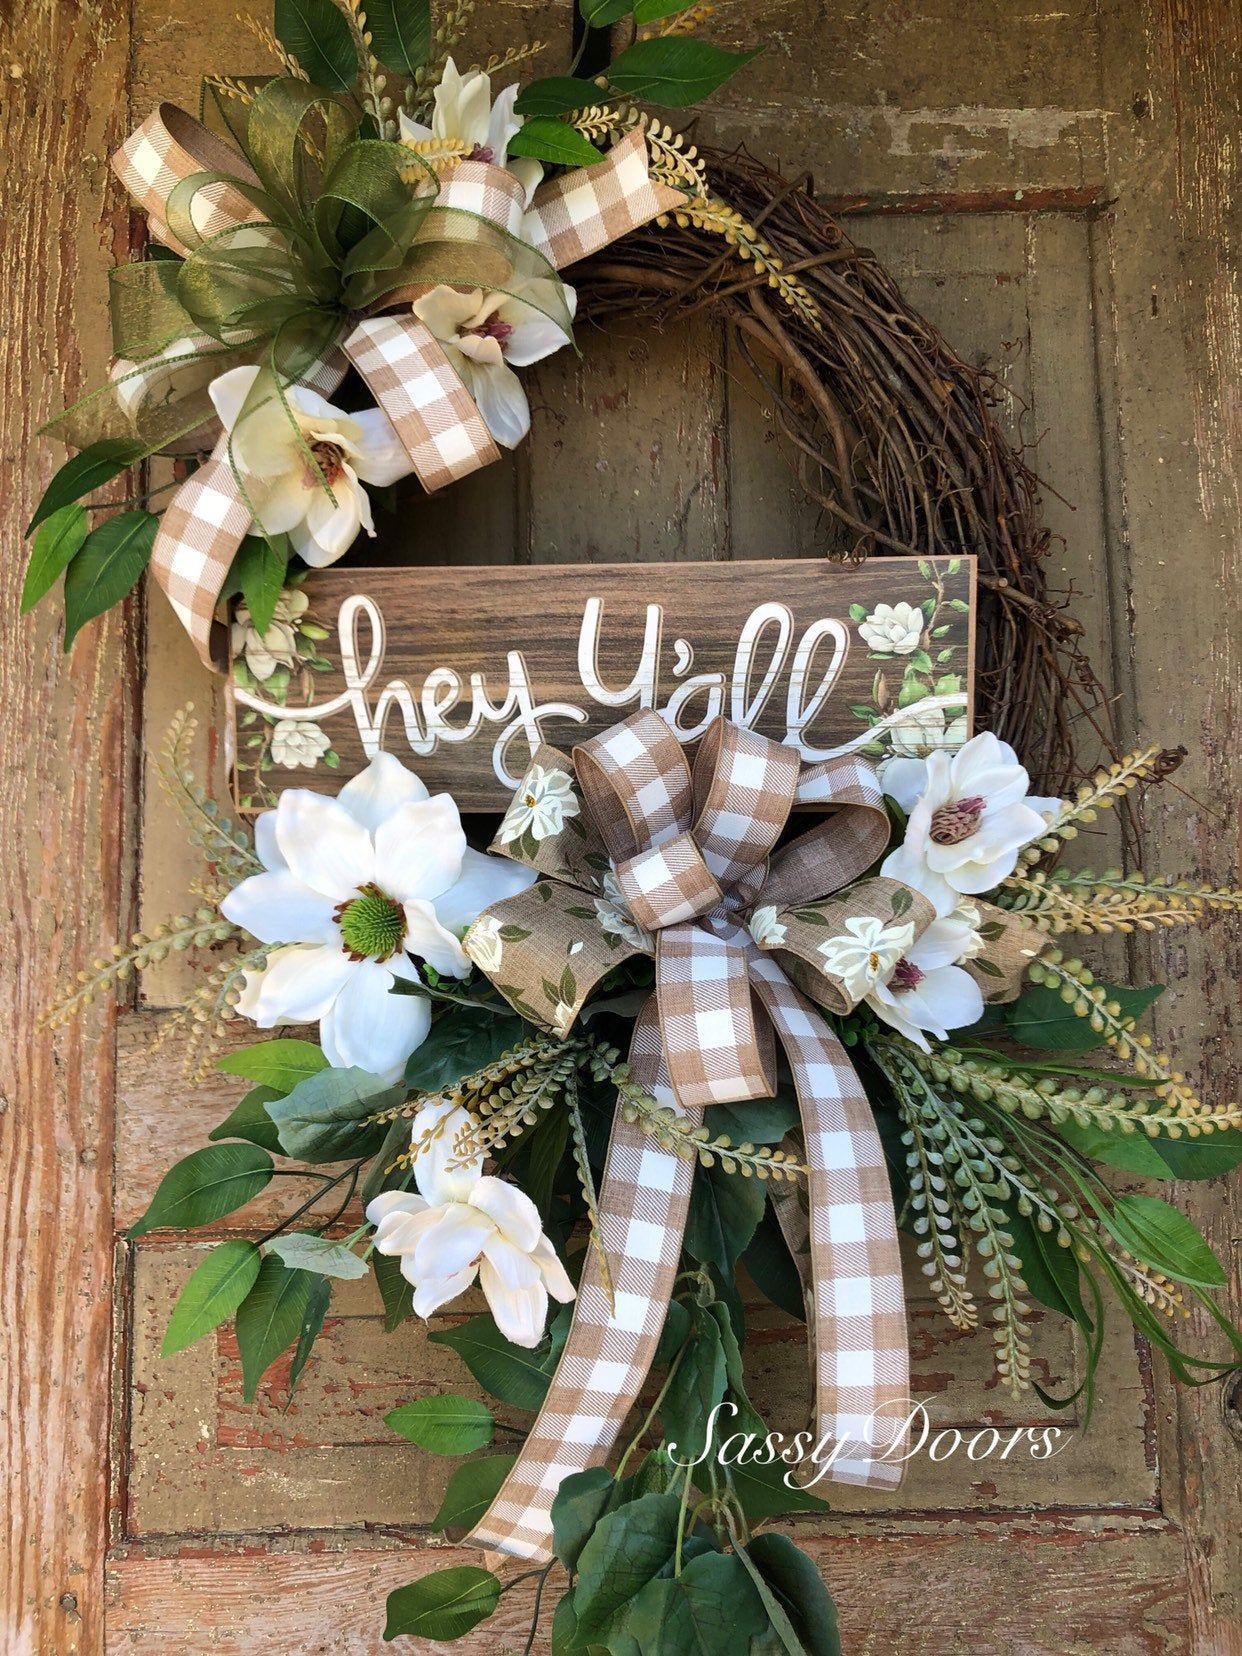 Photo of Everyday Wreath-Grapevine Wreath-Magnolia Wreath For Front Door- Wreath With Magnolias, Wreath-Sassy DoorsWreath,